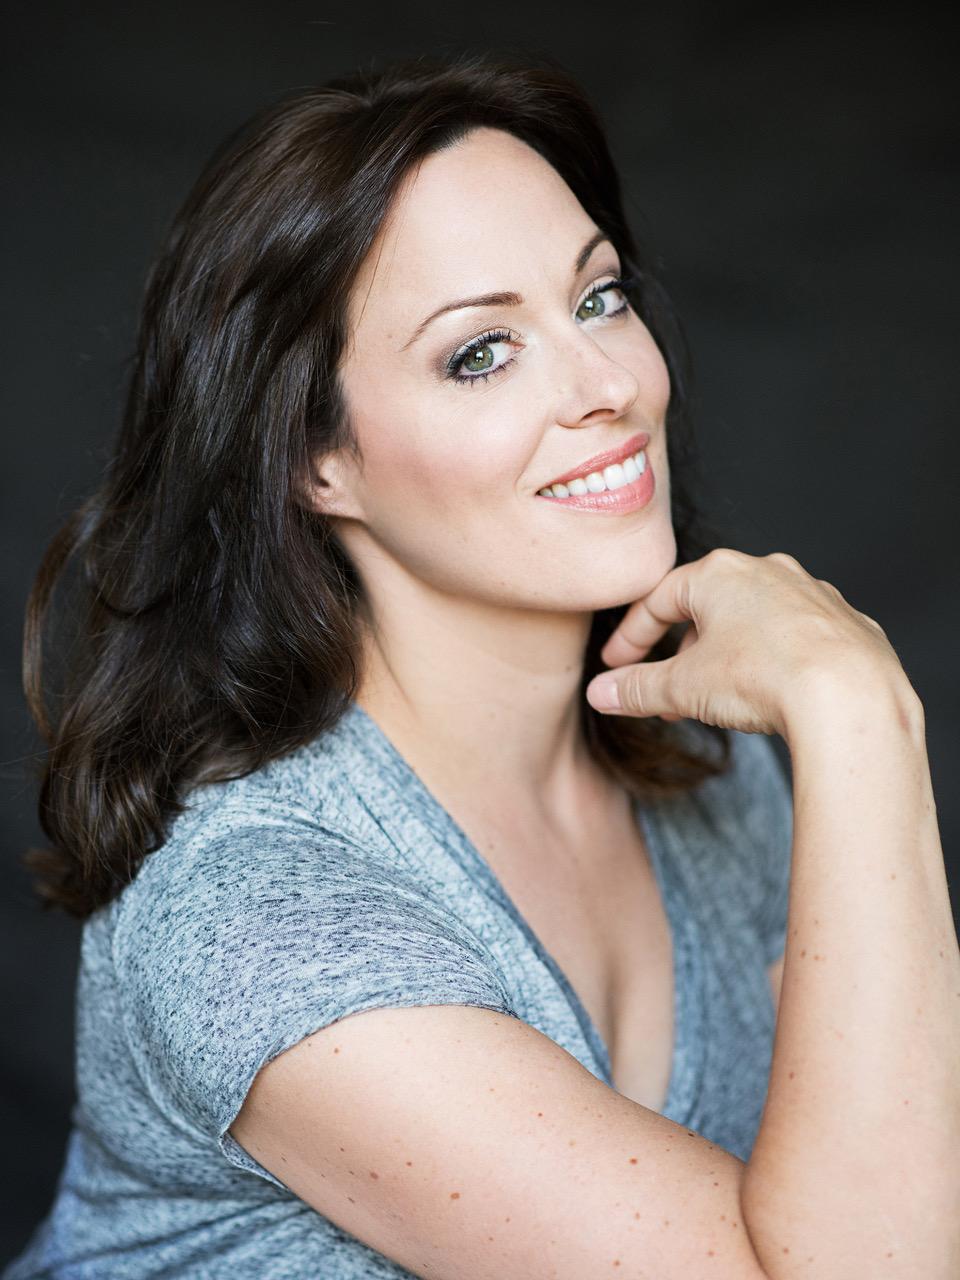 Sabrina Schimanszky